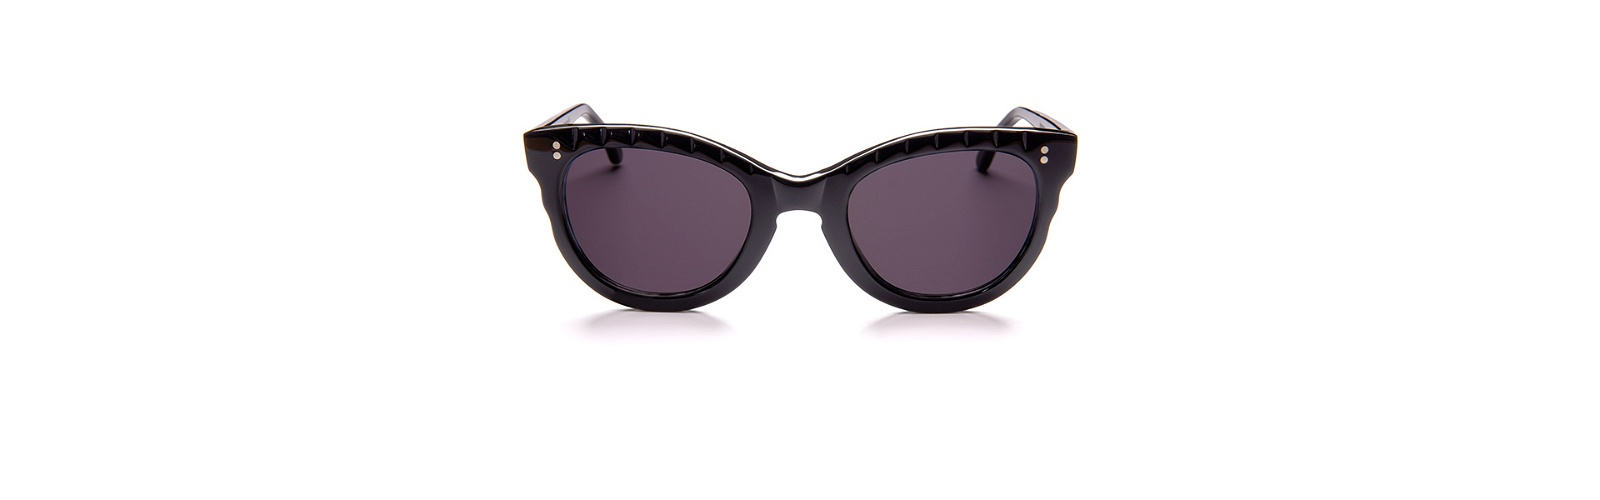 jamboree sunglasses brooklyn black